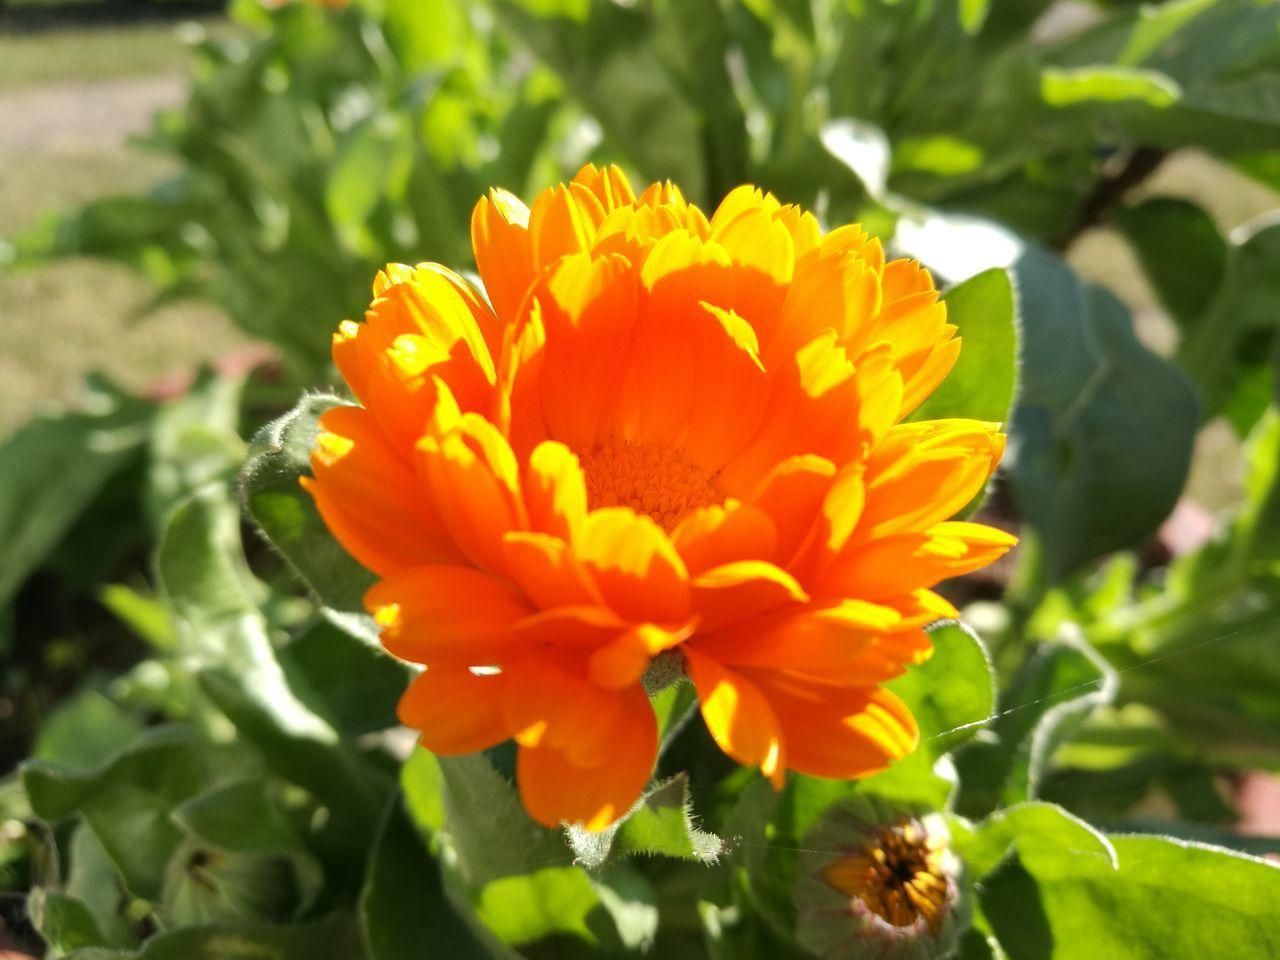 Yellow Flower Flower Green Shiny Medicinal Plant